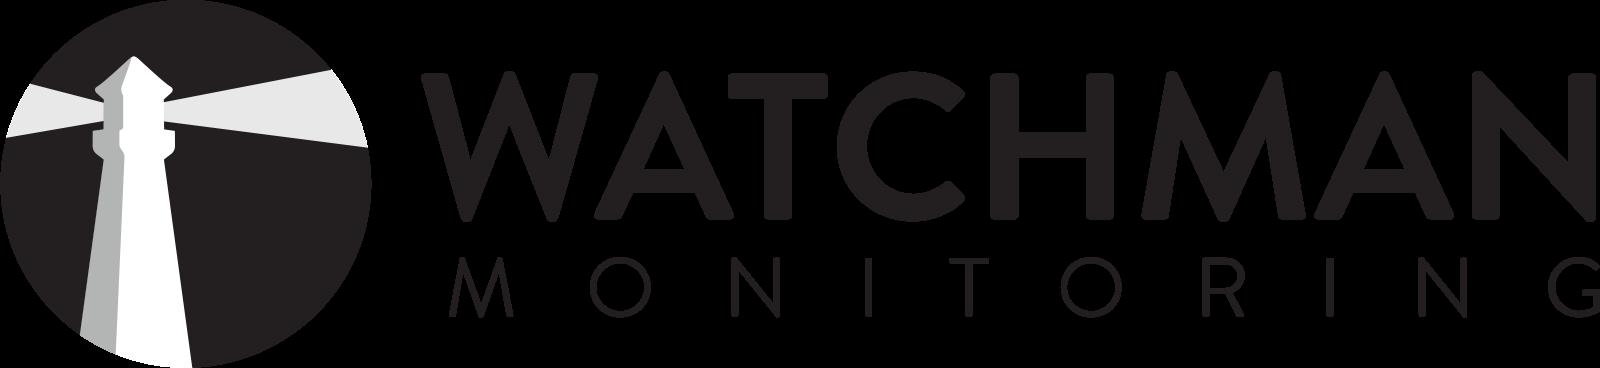 Watchman-Monitoring-logo-1-color.png